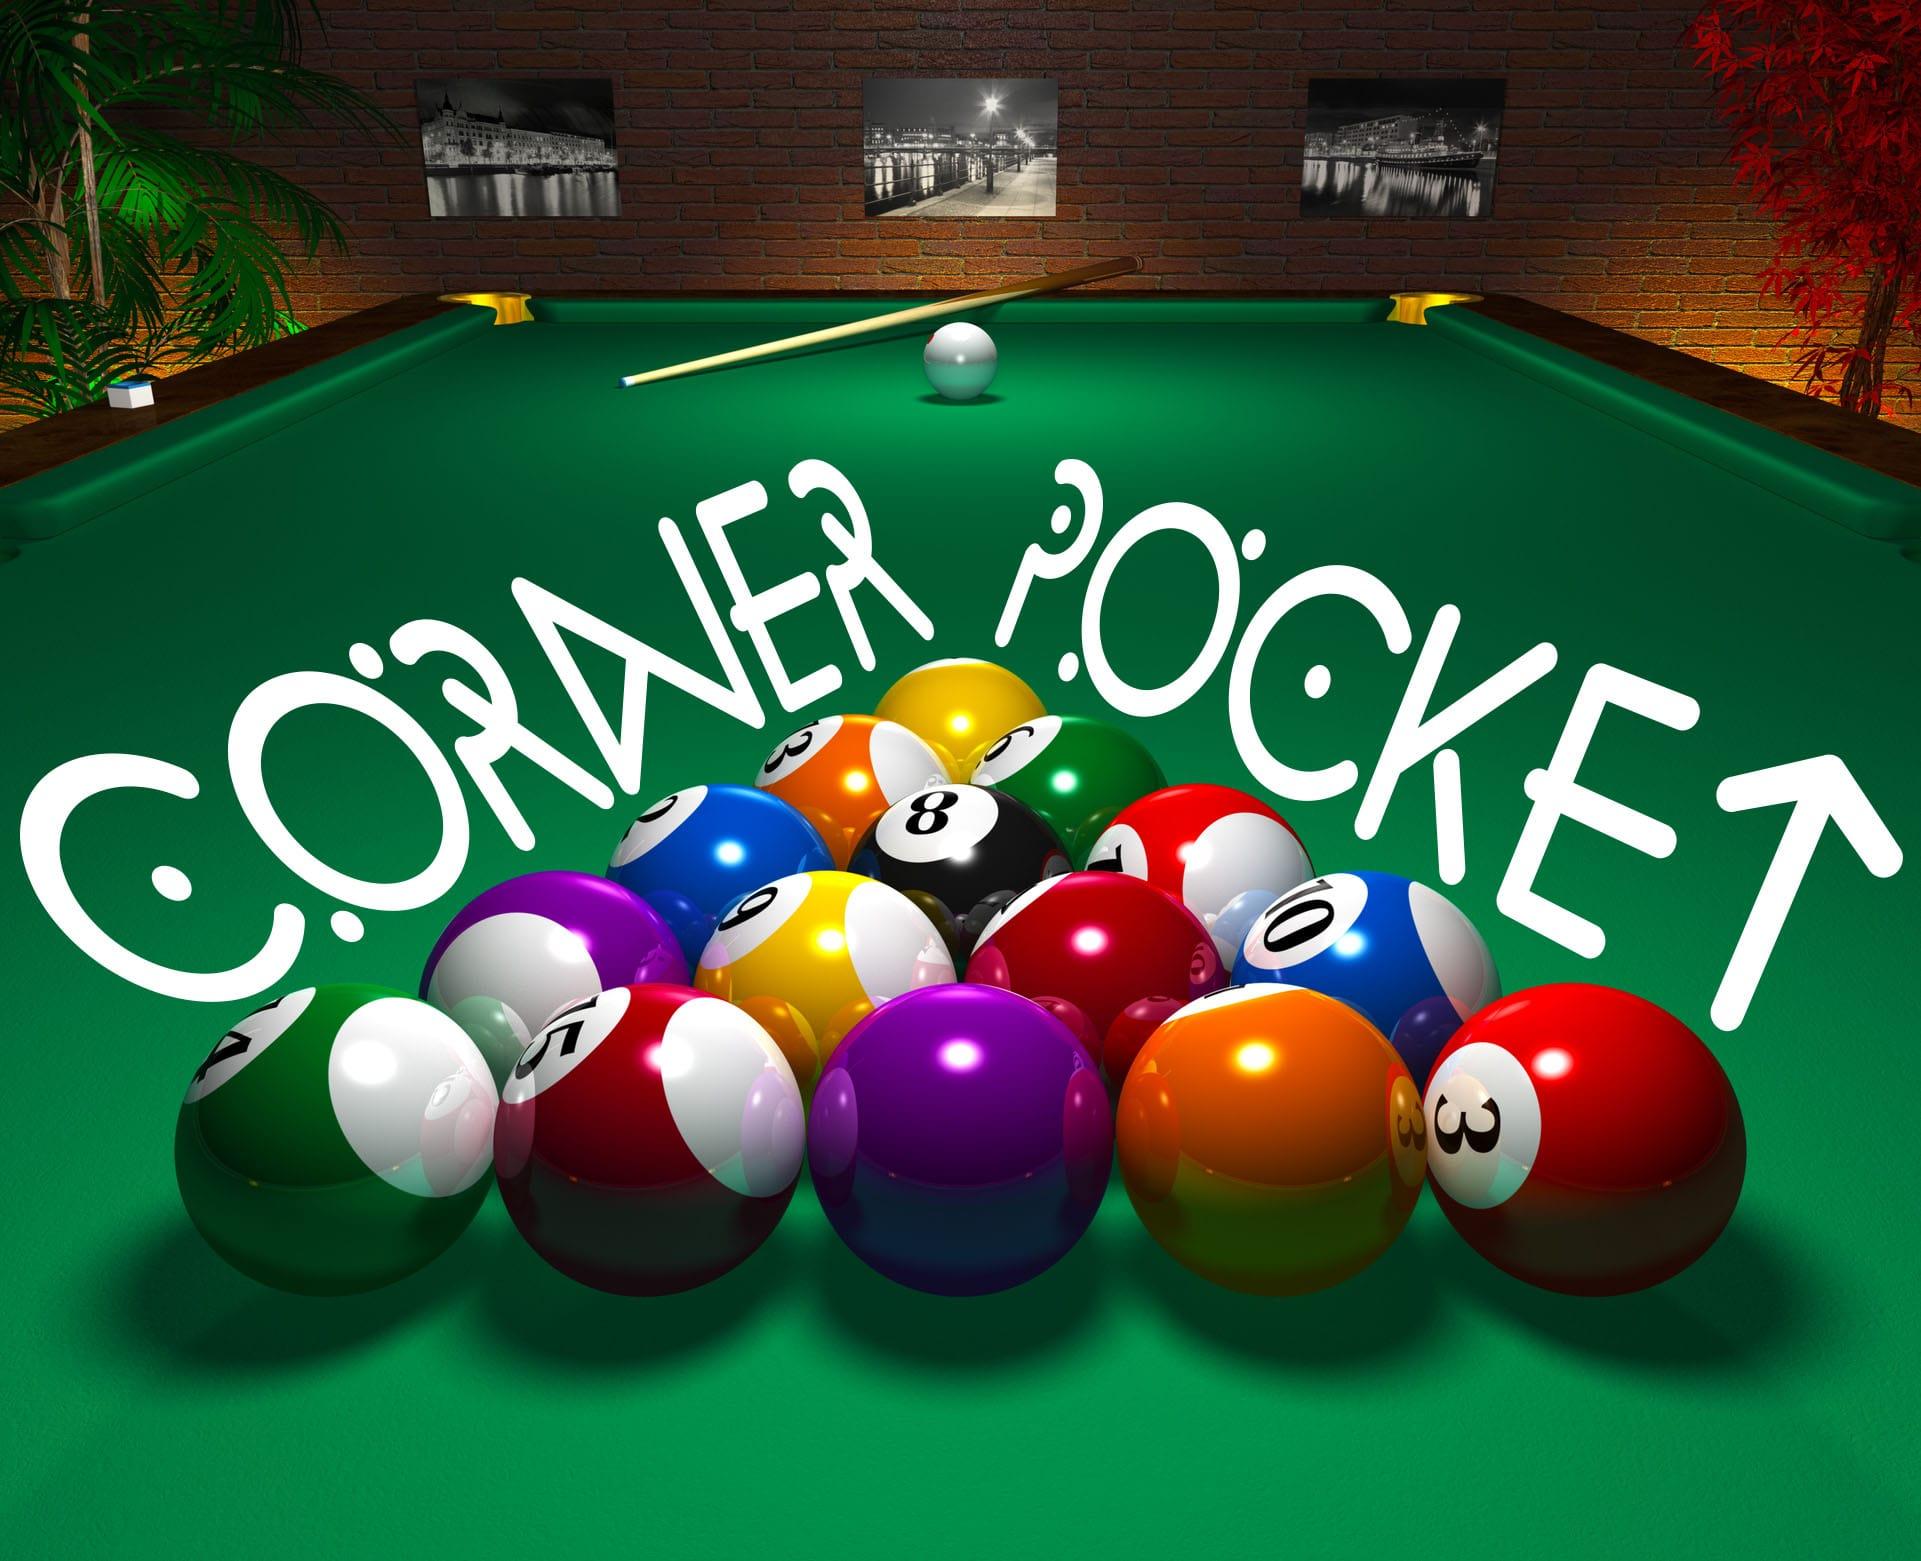 Corner Pocket-min.jpg